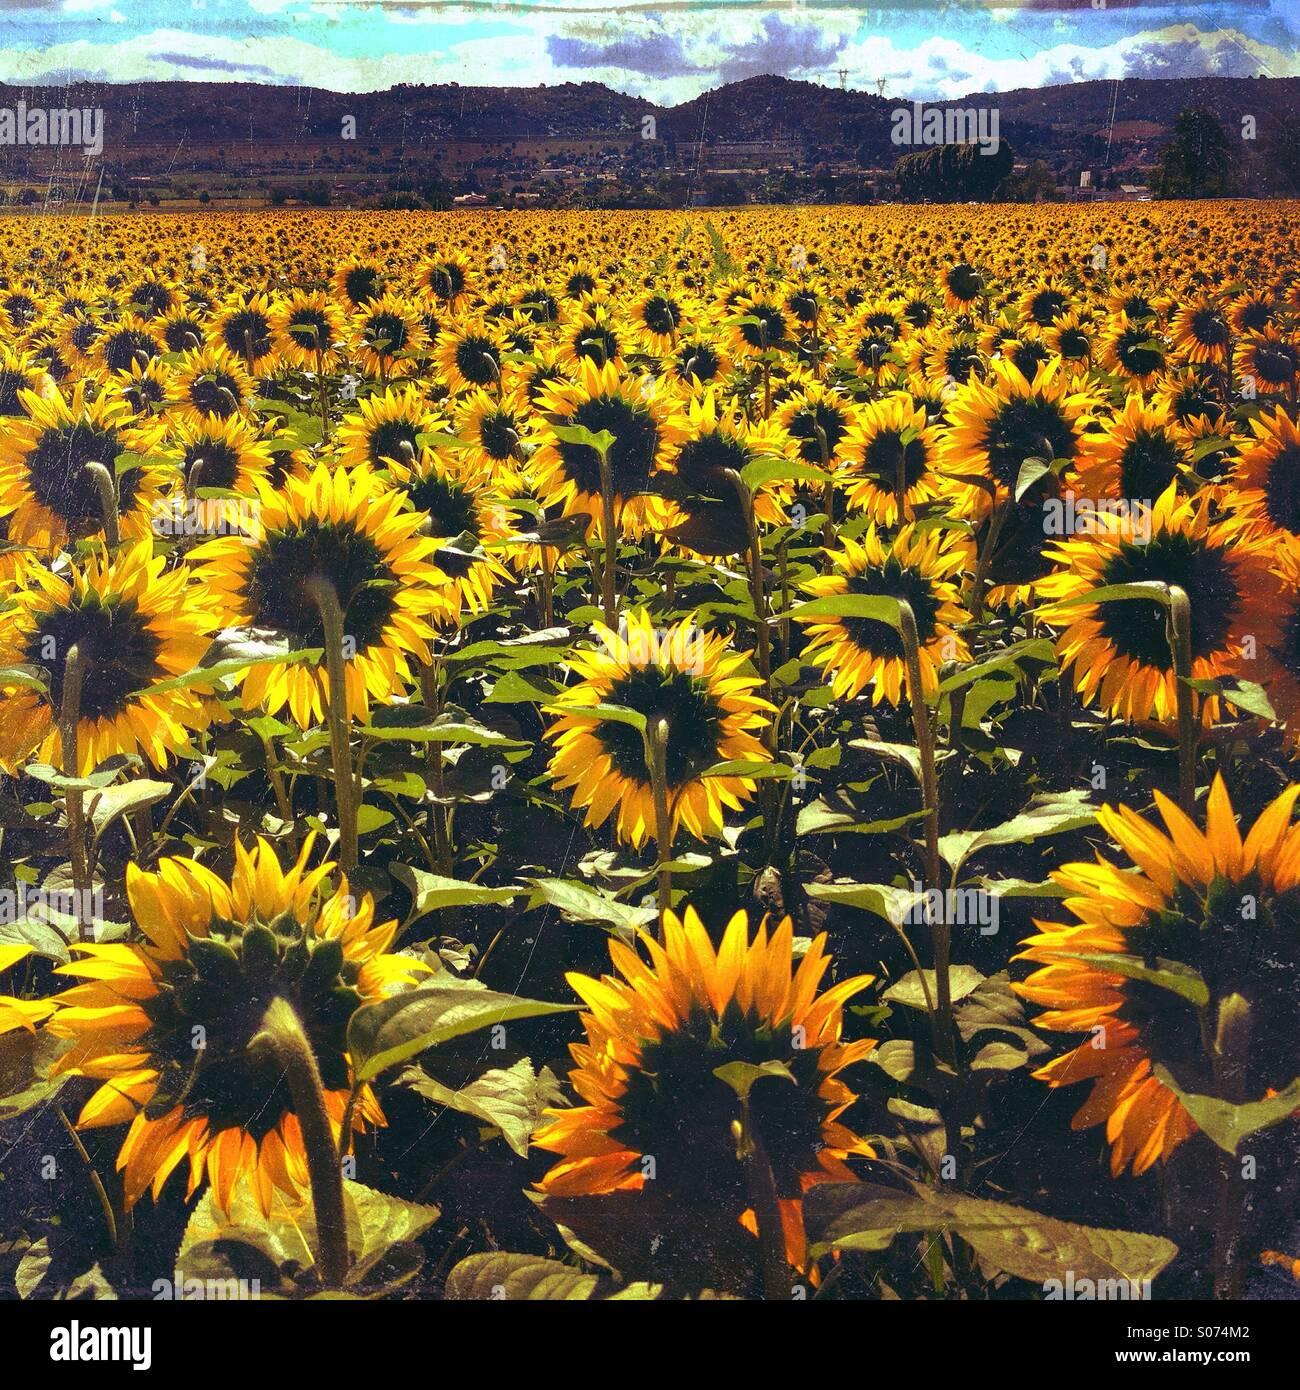 Campo de girasoles amarillos gigantes en flor en verano, Oraison Alpes-de-Haute-Provence, Provence-Alpes-Côte-d'Azur, Foto de stock